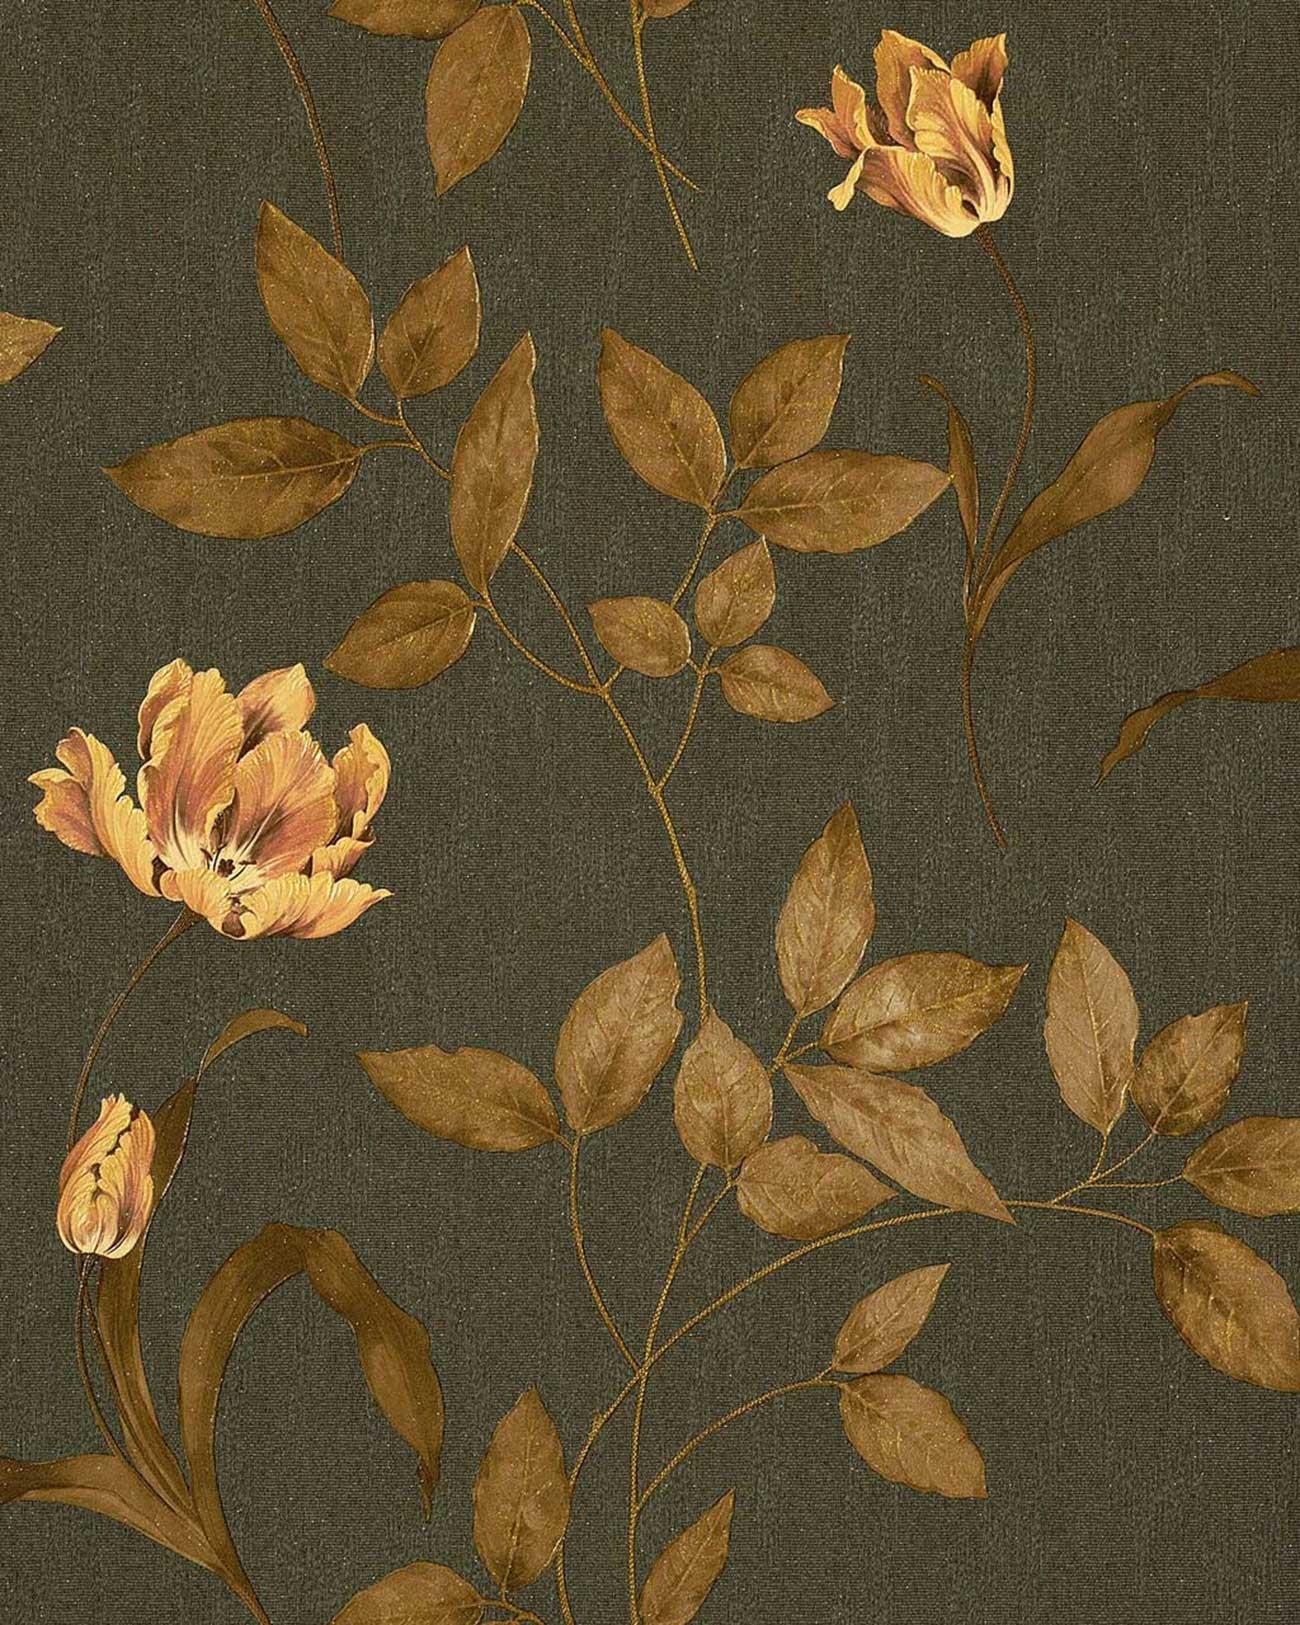 Textil Tapete Ueberstreichen : Brown Copper and Gold Fabric